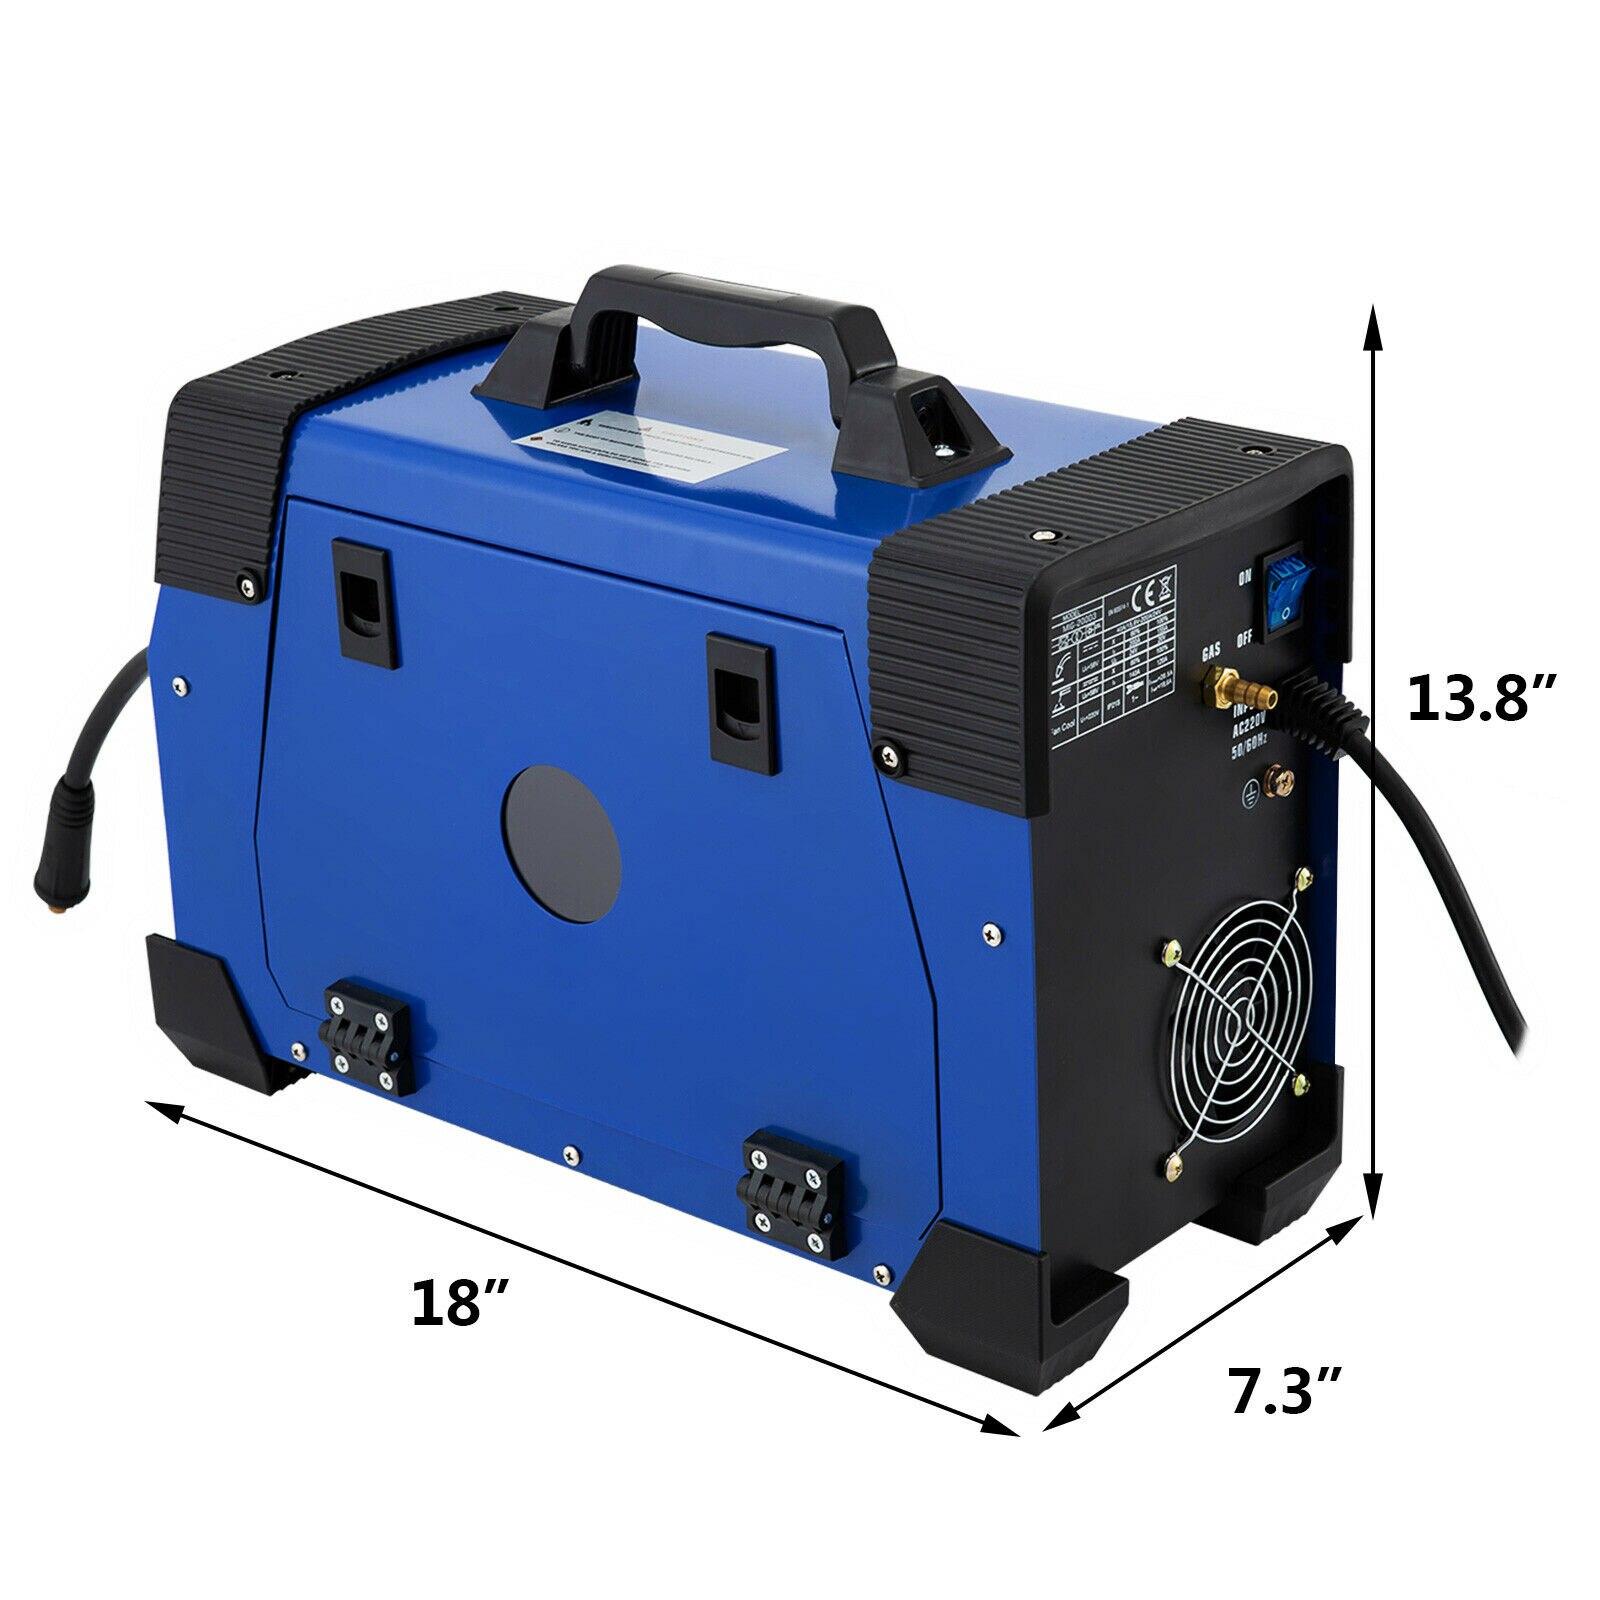 TIG MIG Inverter Welding Machine MAG MMA E-Hand FCAW Electrode Welding Machine 230V 200A